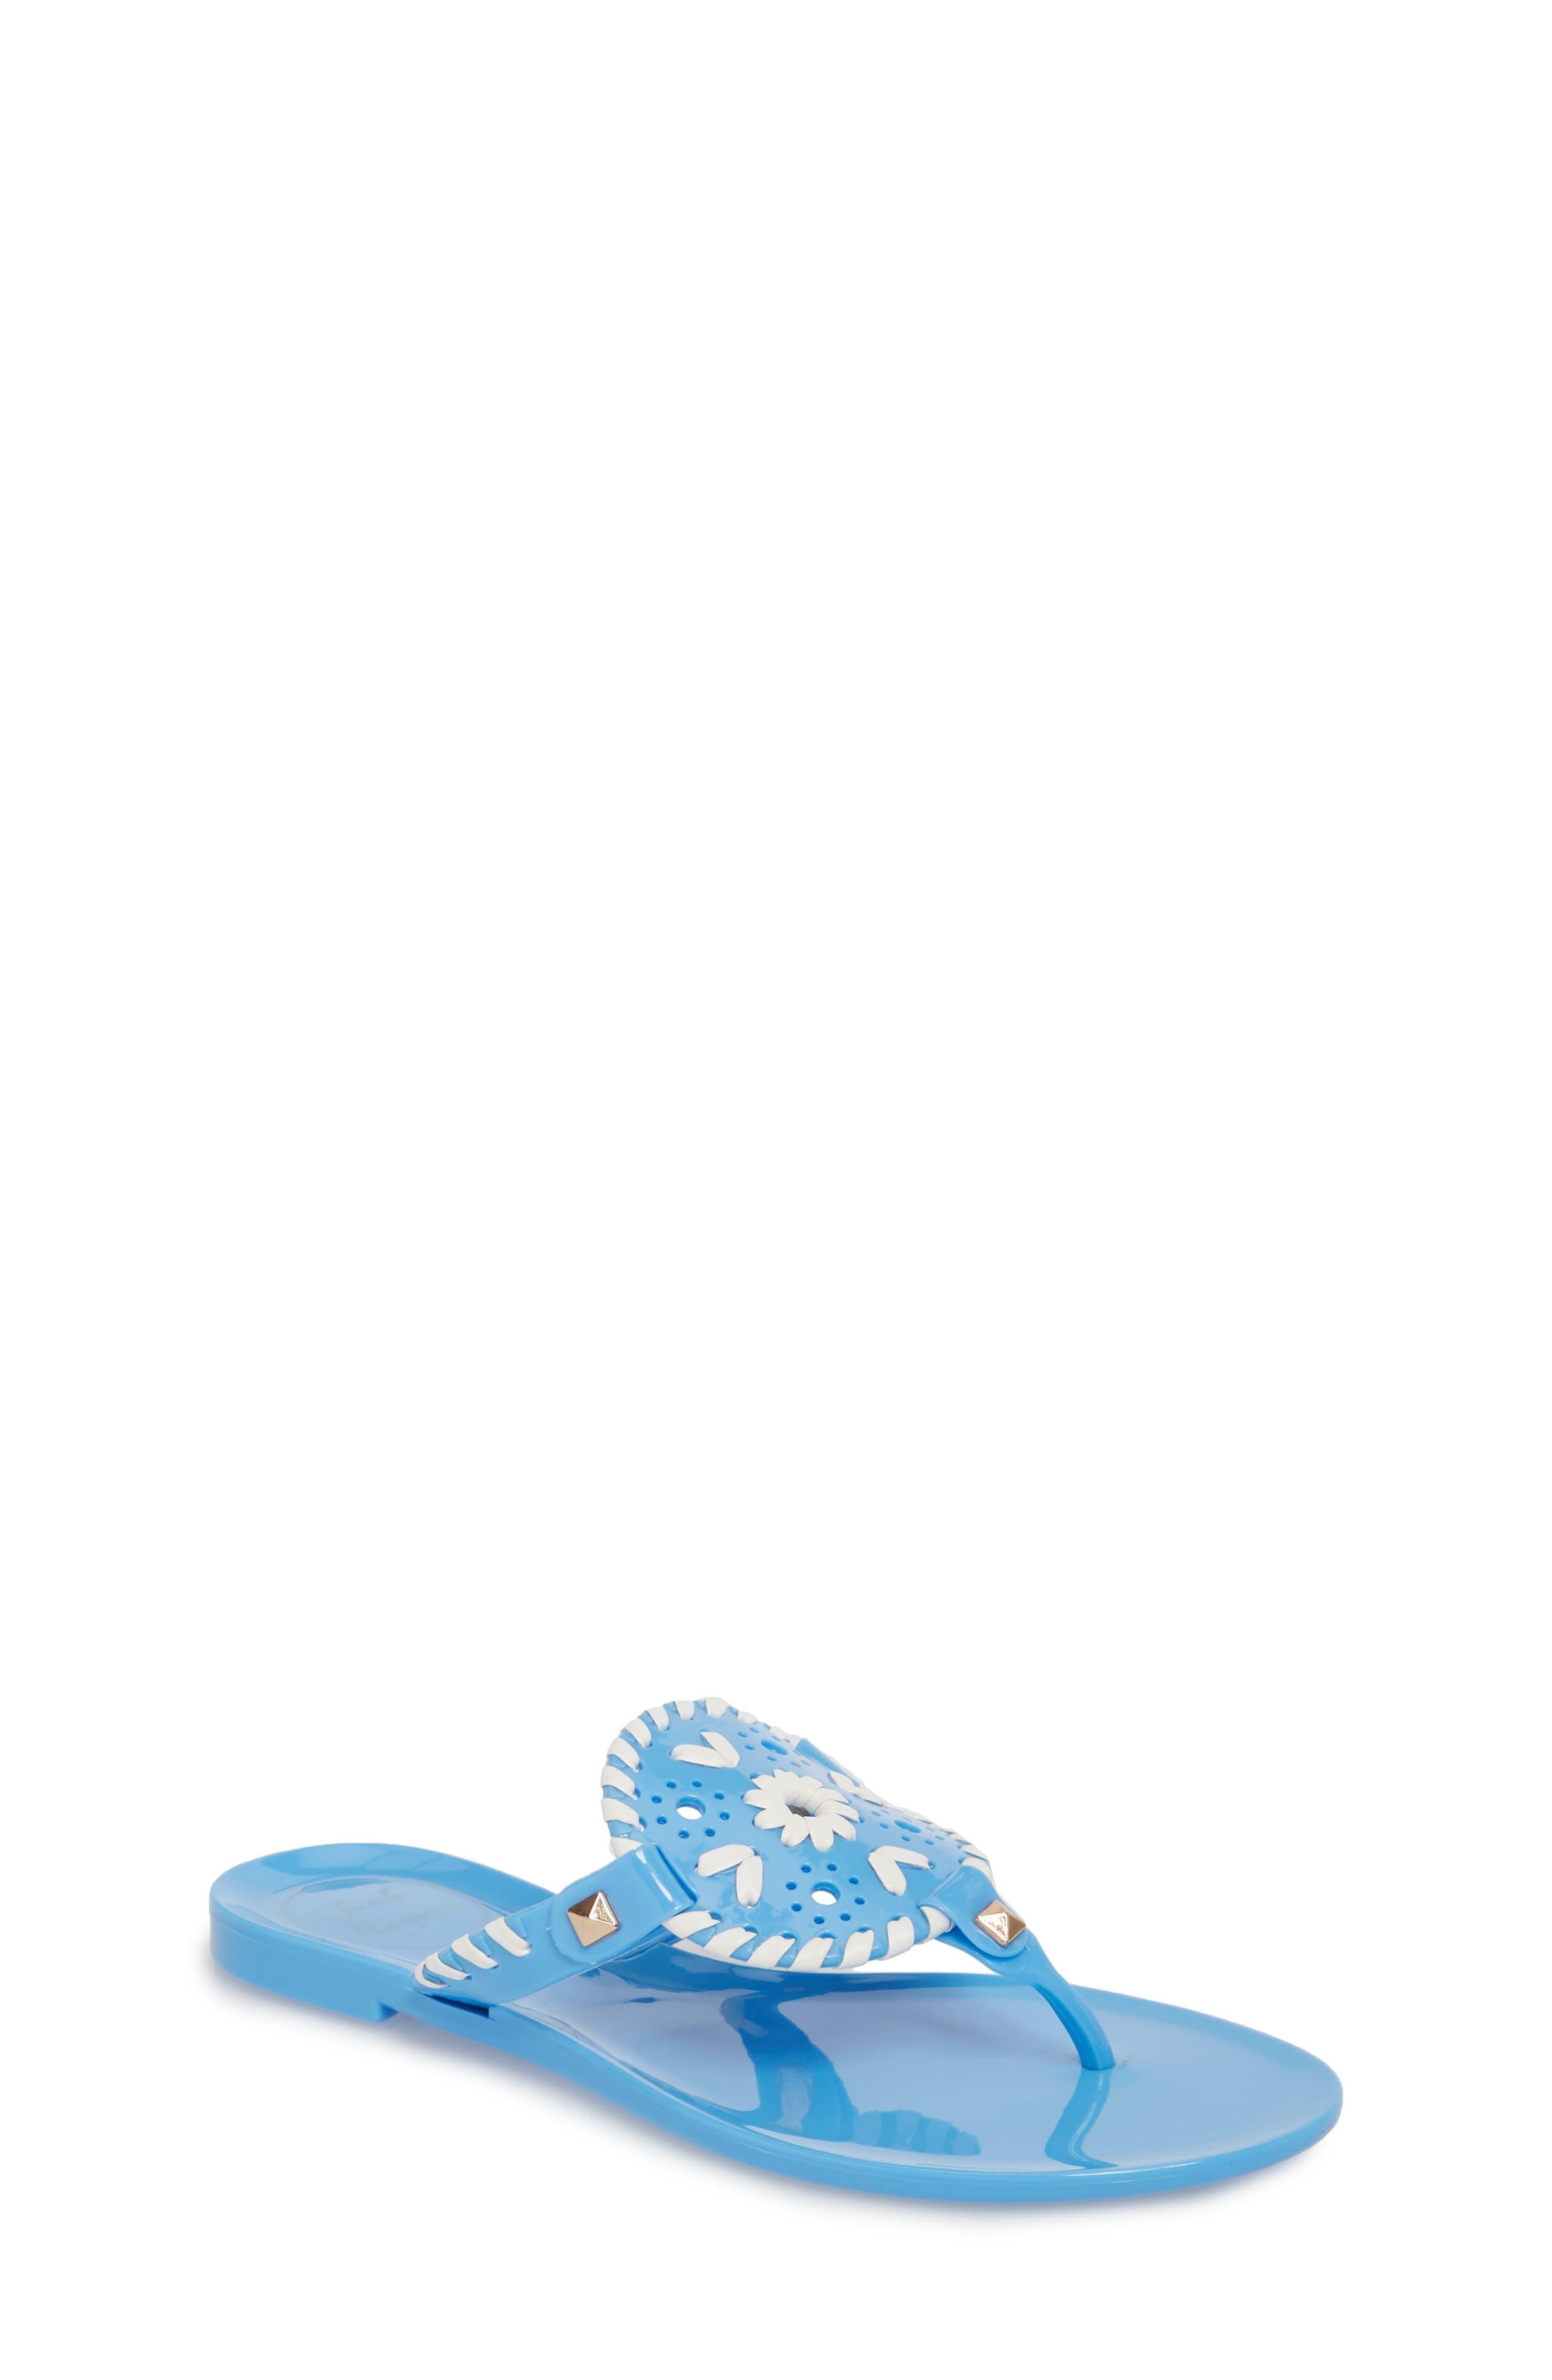 Jack Rogers 'Miss Georgica' Jelly Flip Flop (Walker, Toddler, Little Kid & Big Kid)